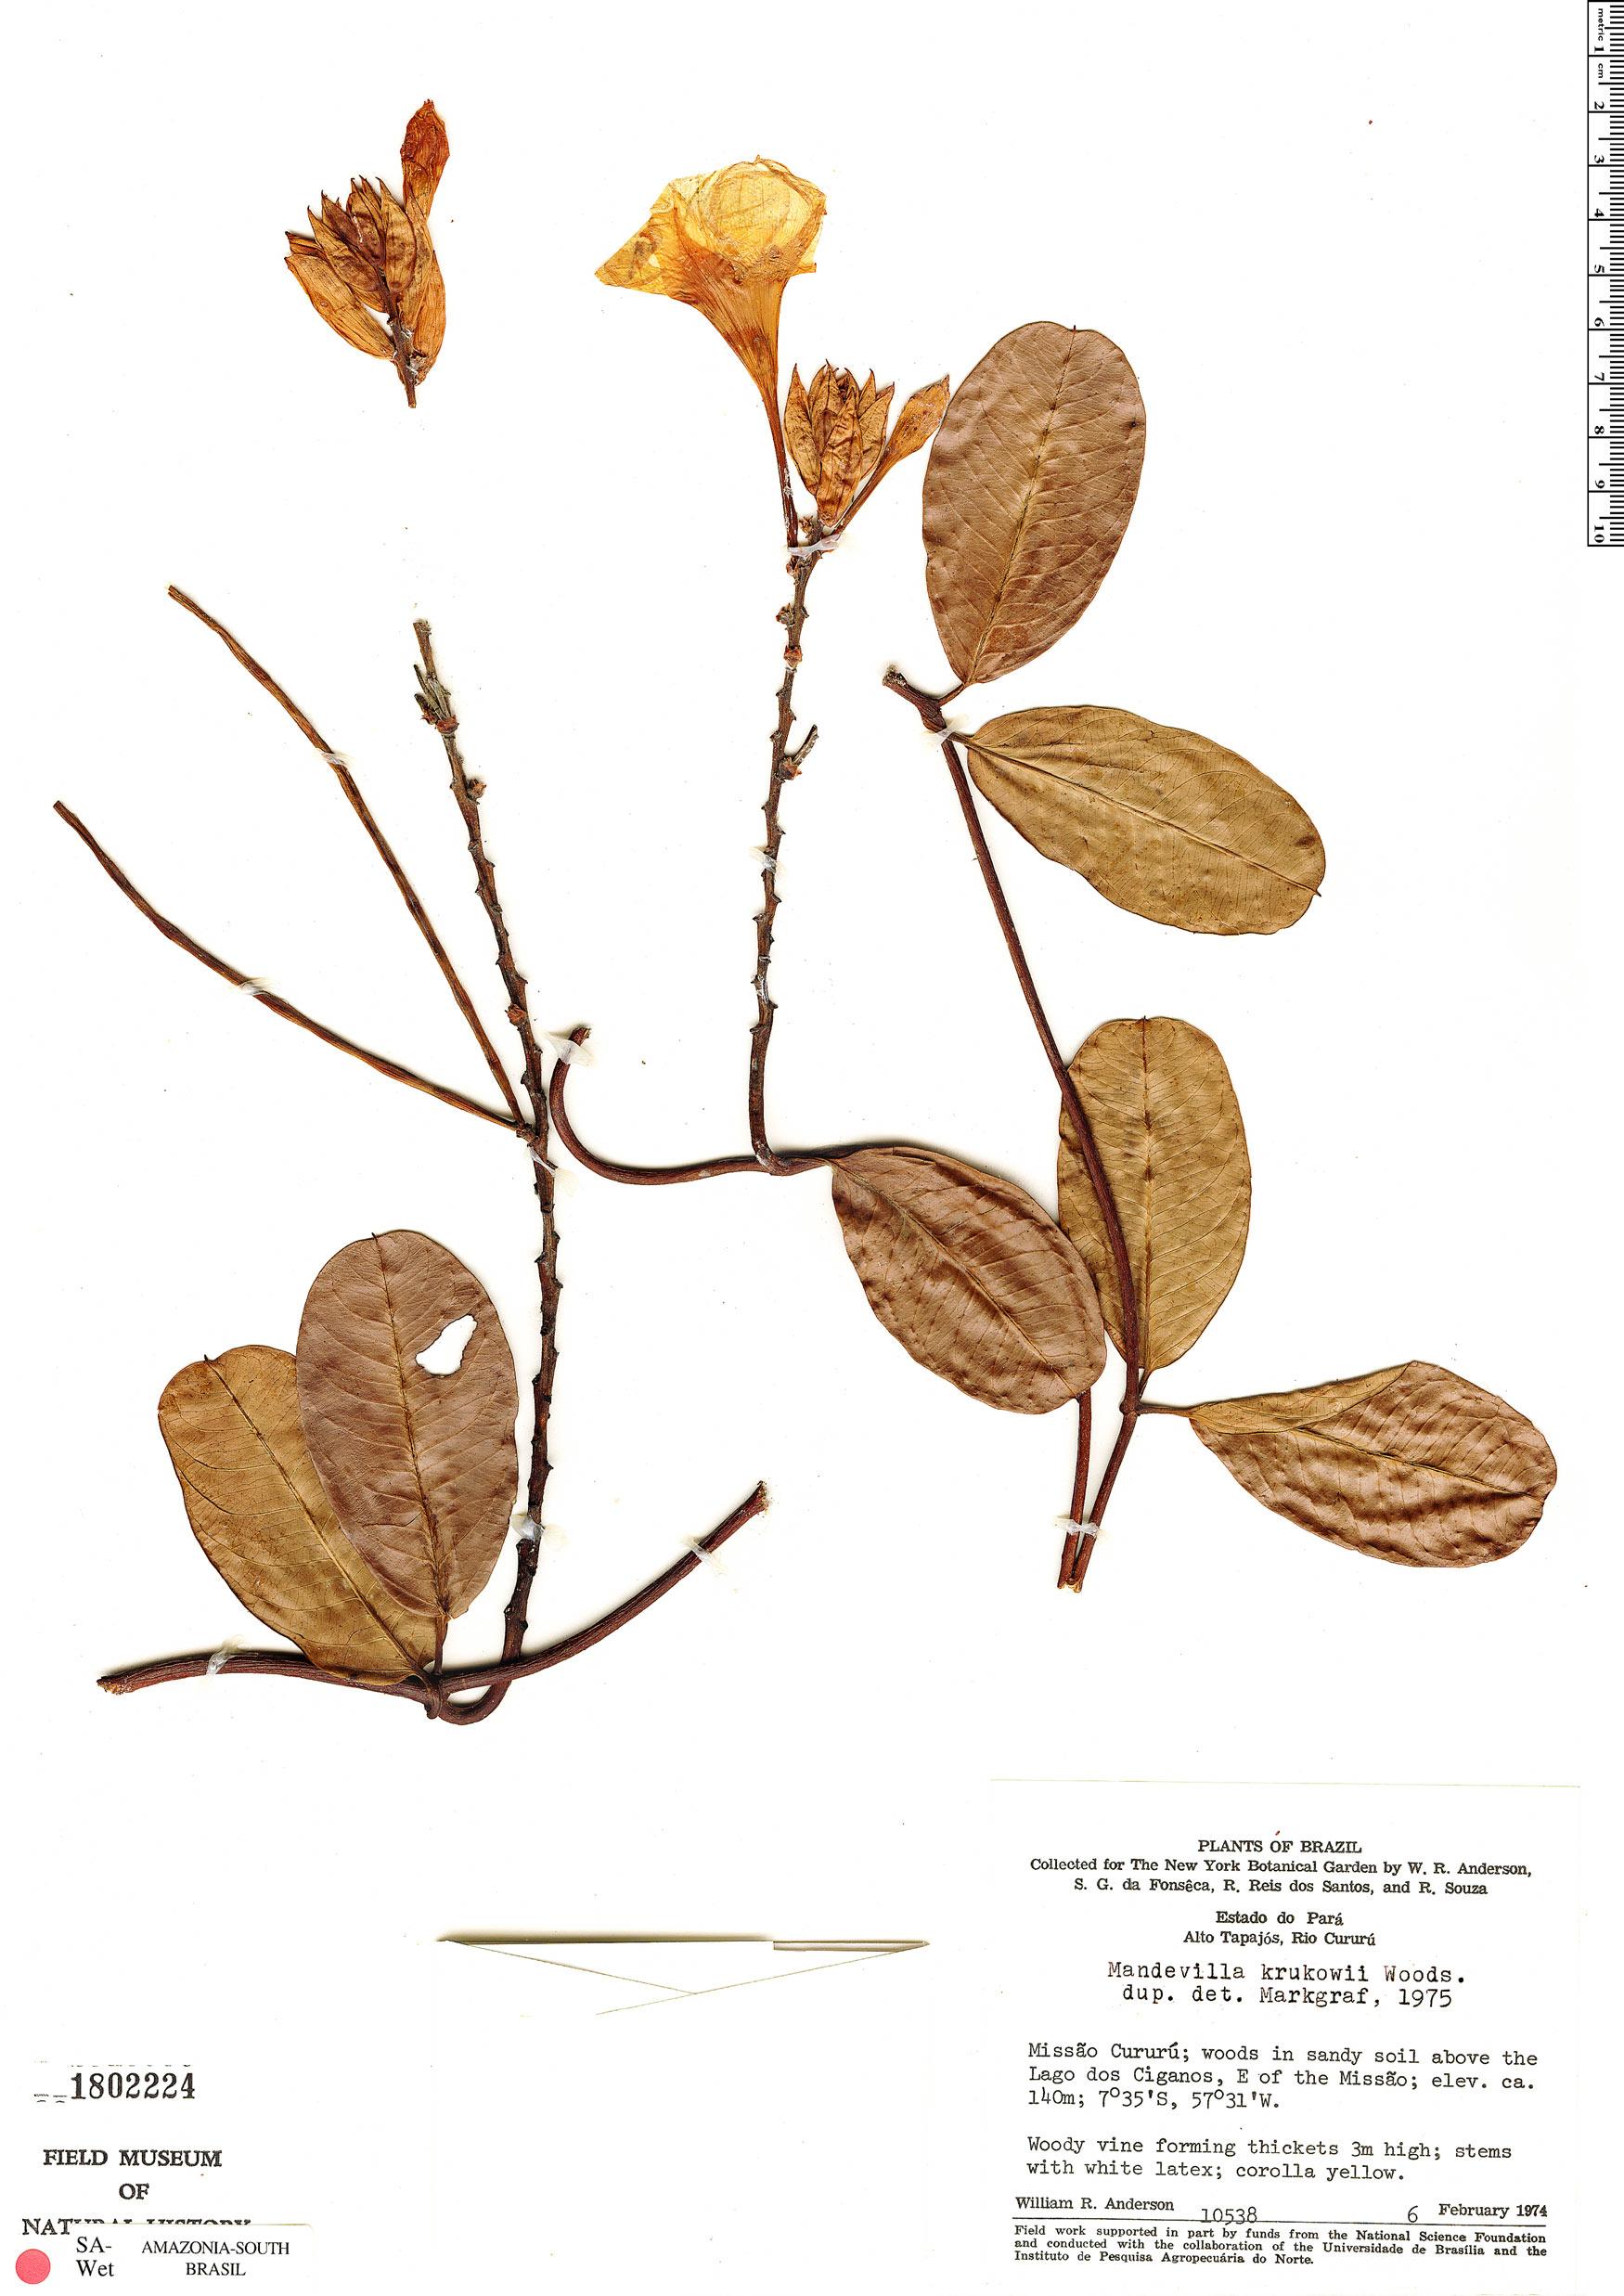 Espécimen: Mandevilla krukovii